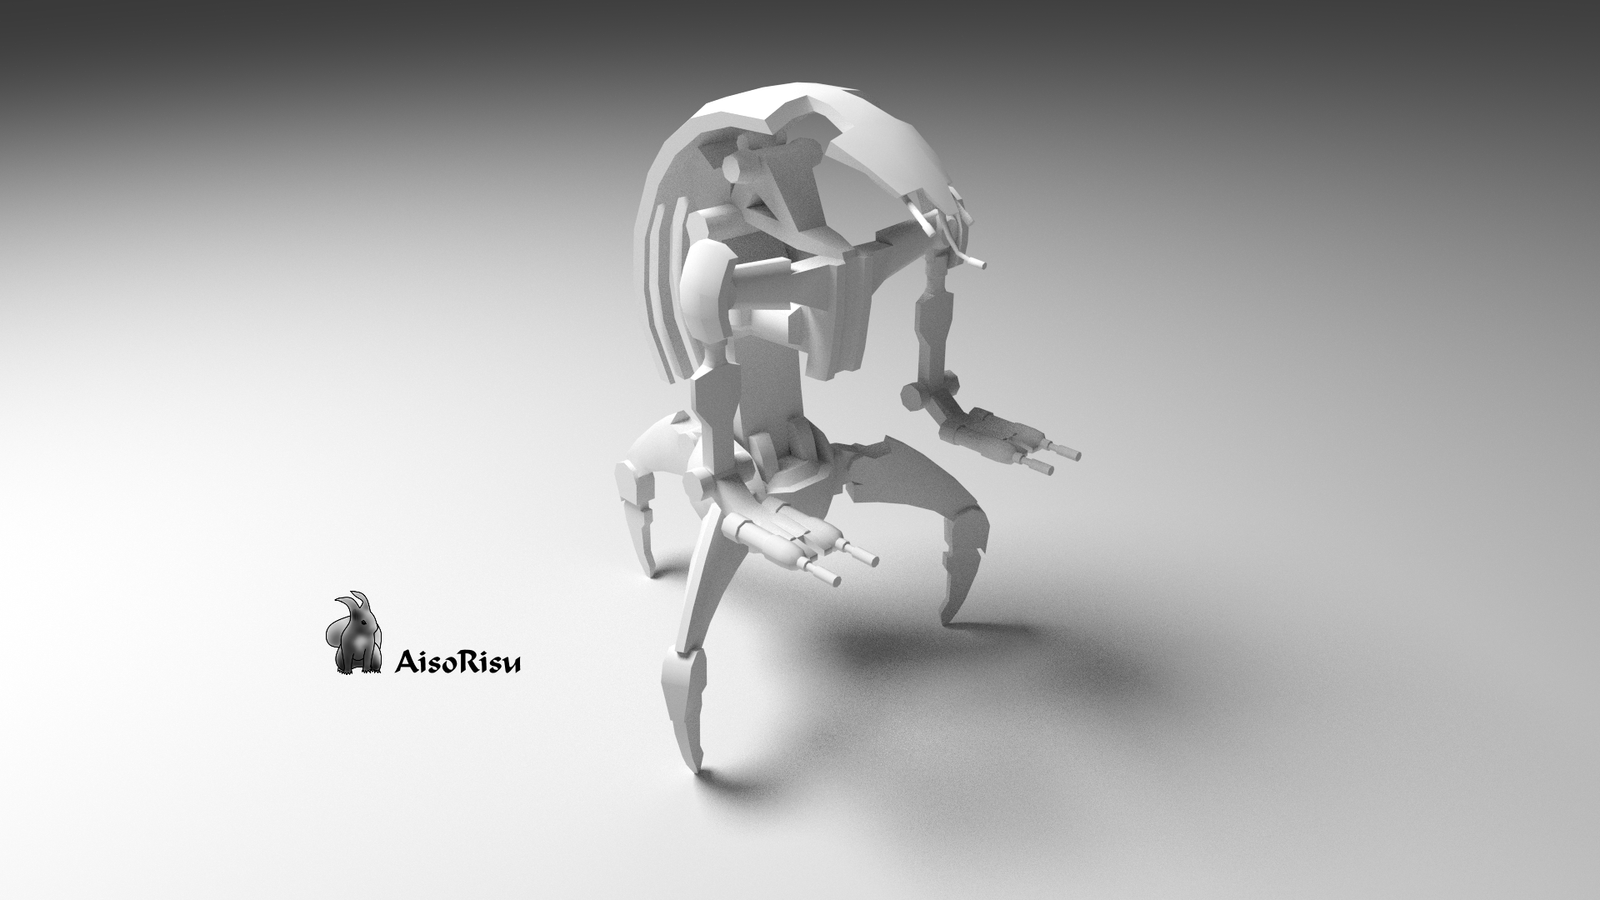 Star wars droideka 3d game model by aisorisu on deviantart for 3d star net